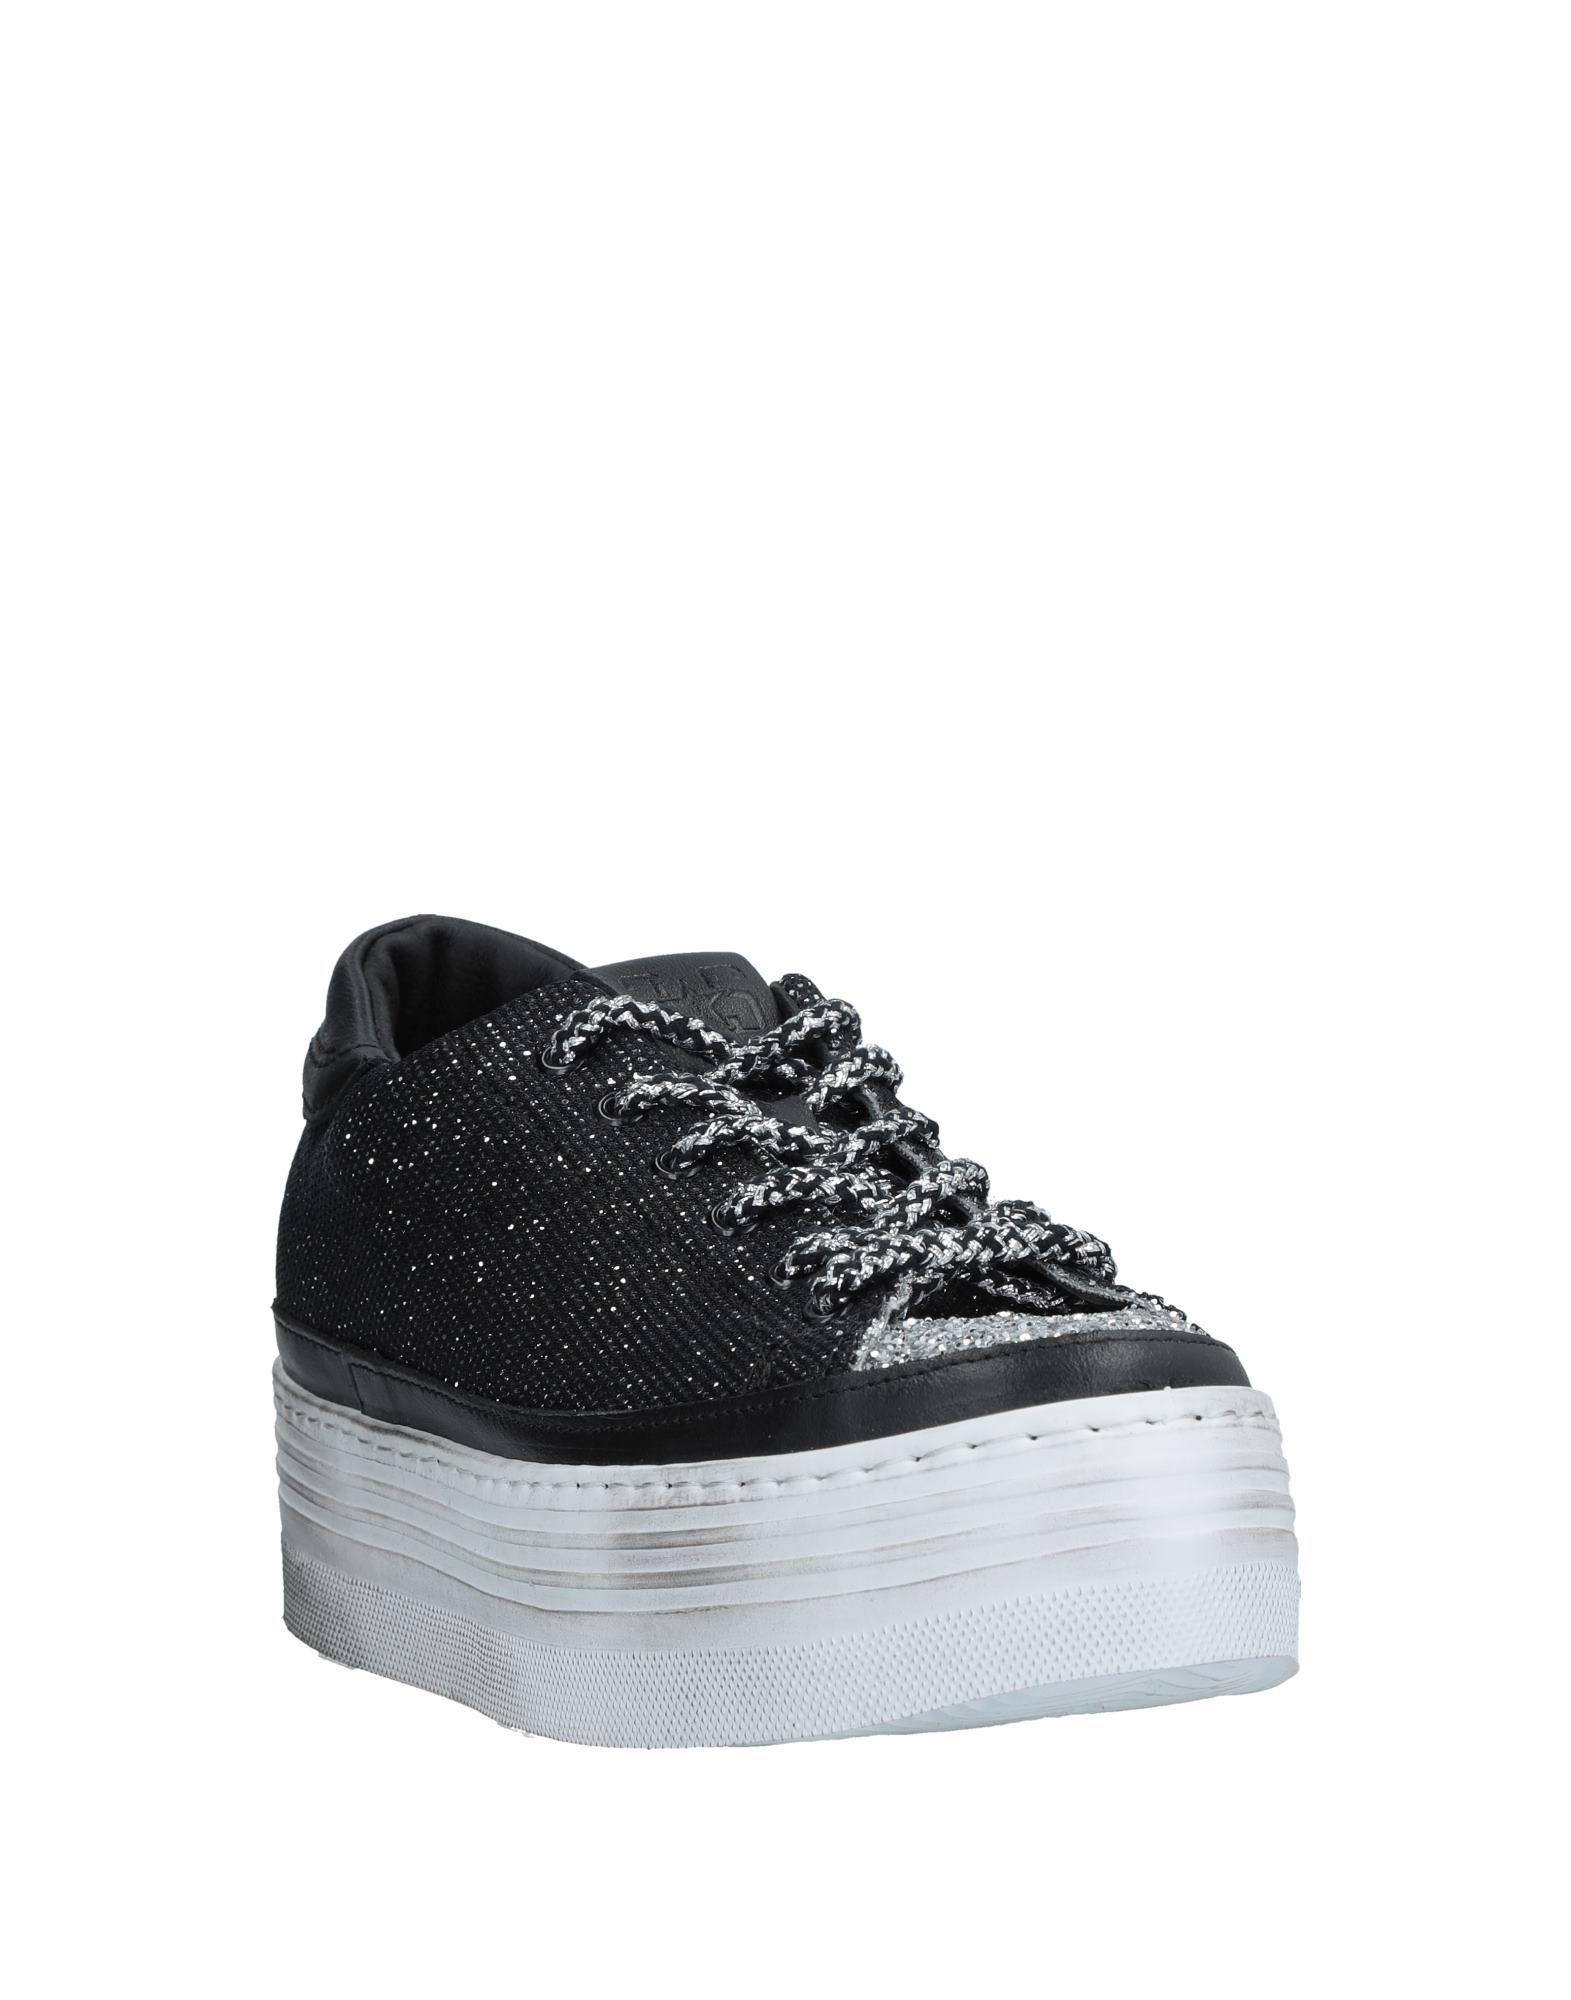 2Star Sneakers  Damen  Sneakers 11538451VQ Heiße Schuhe 0a4df1